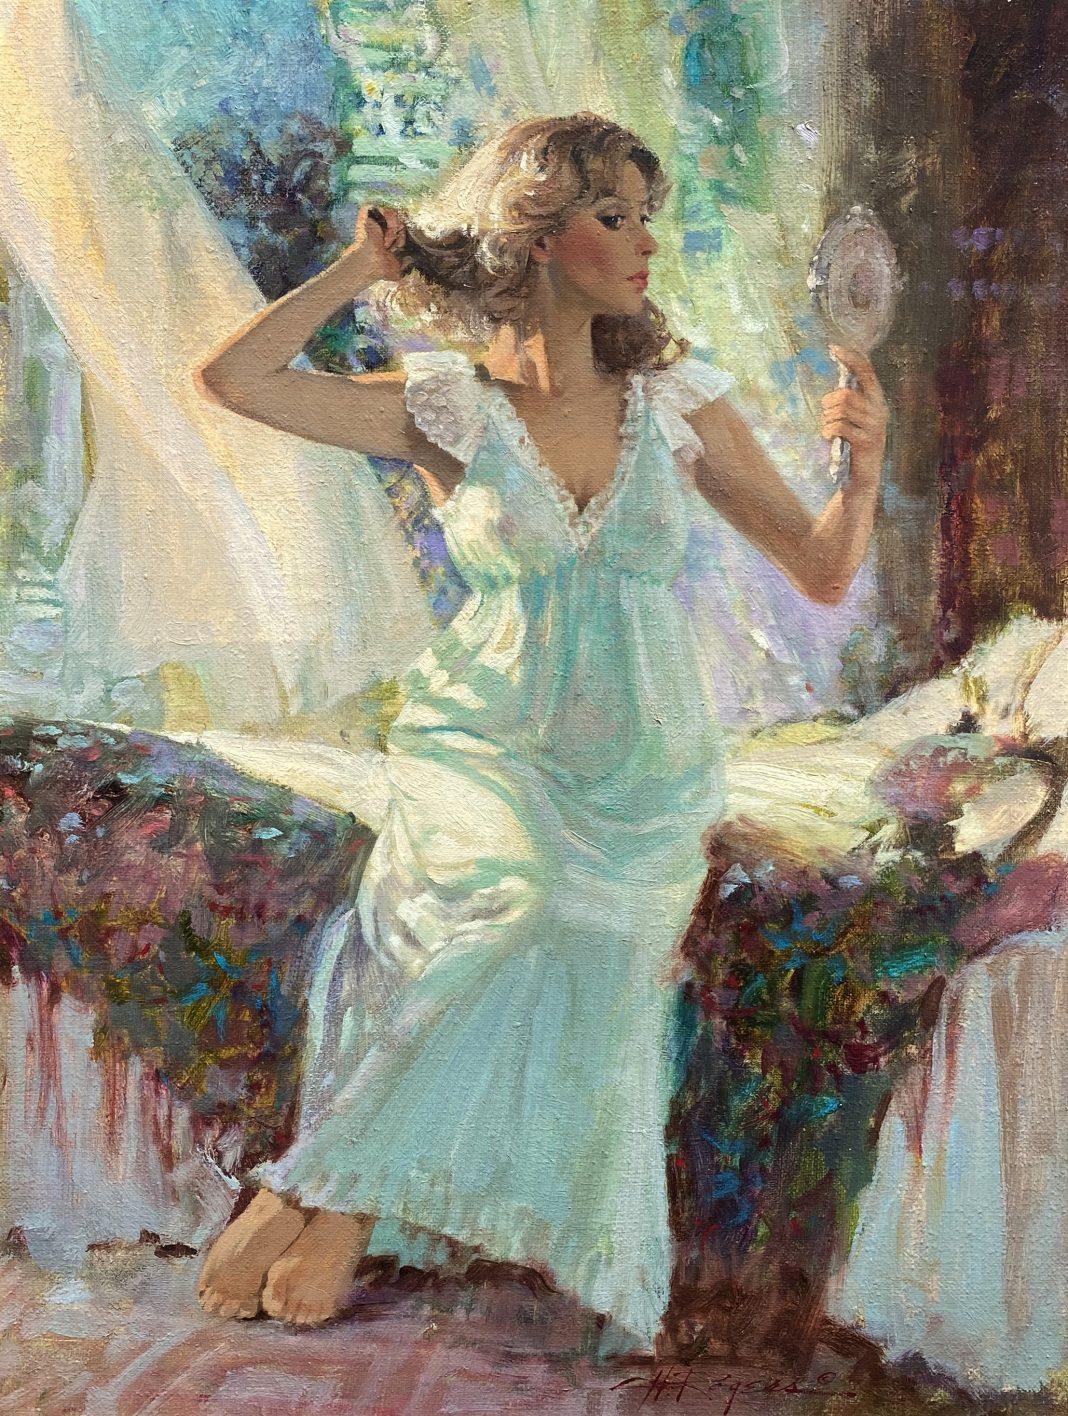 Howard Rogers Nighttime Beauty figure figurative woman girl intimate oil painting